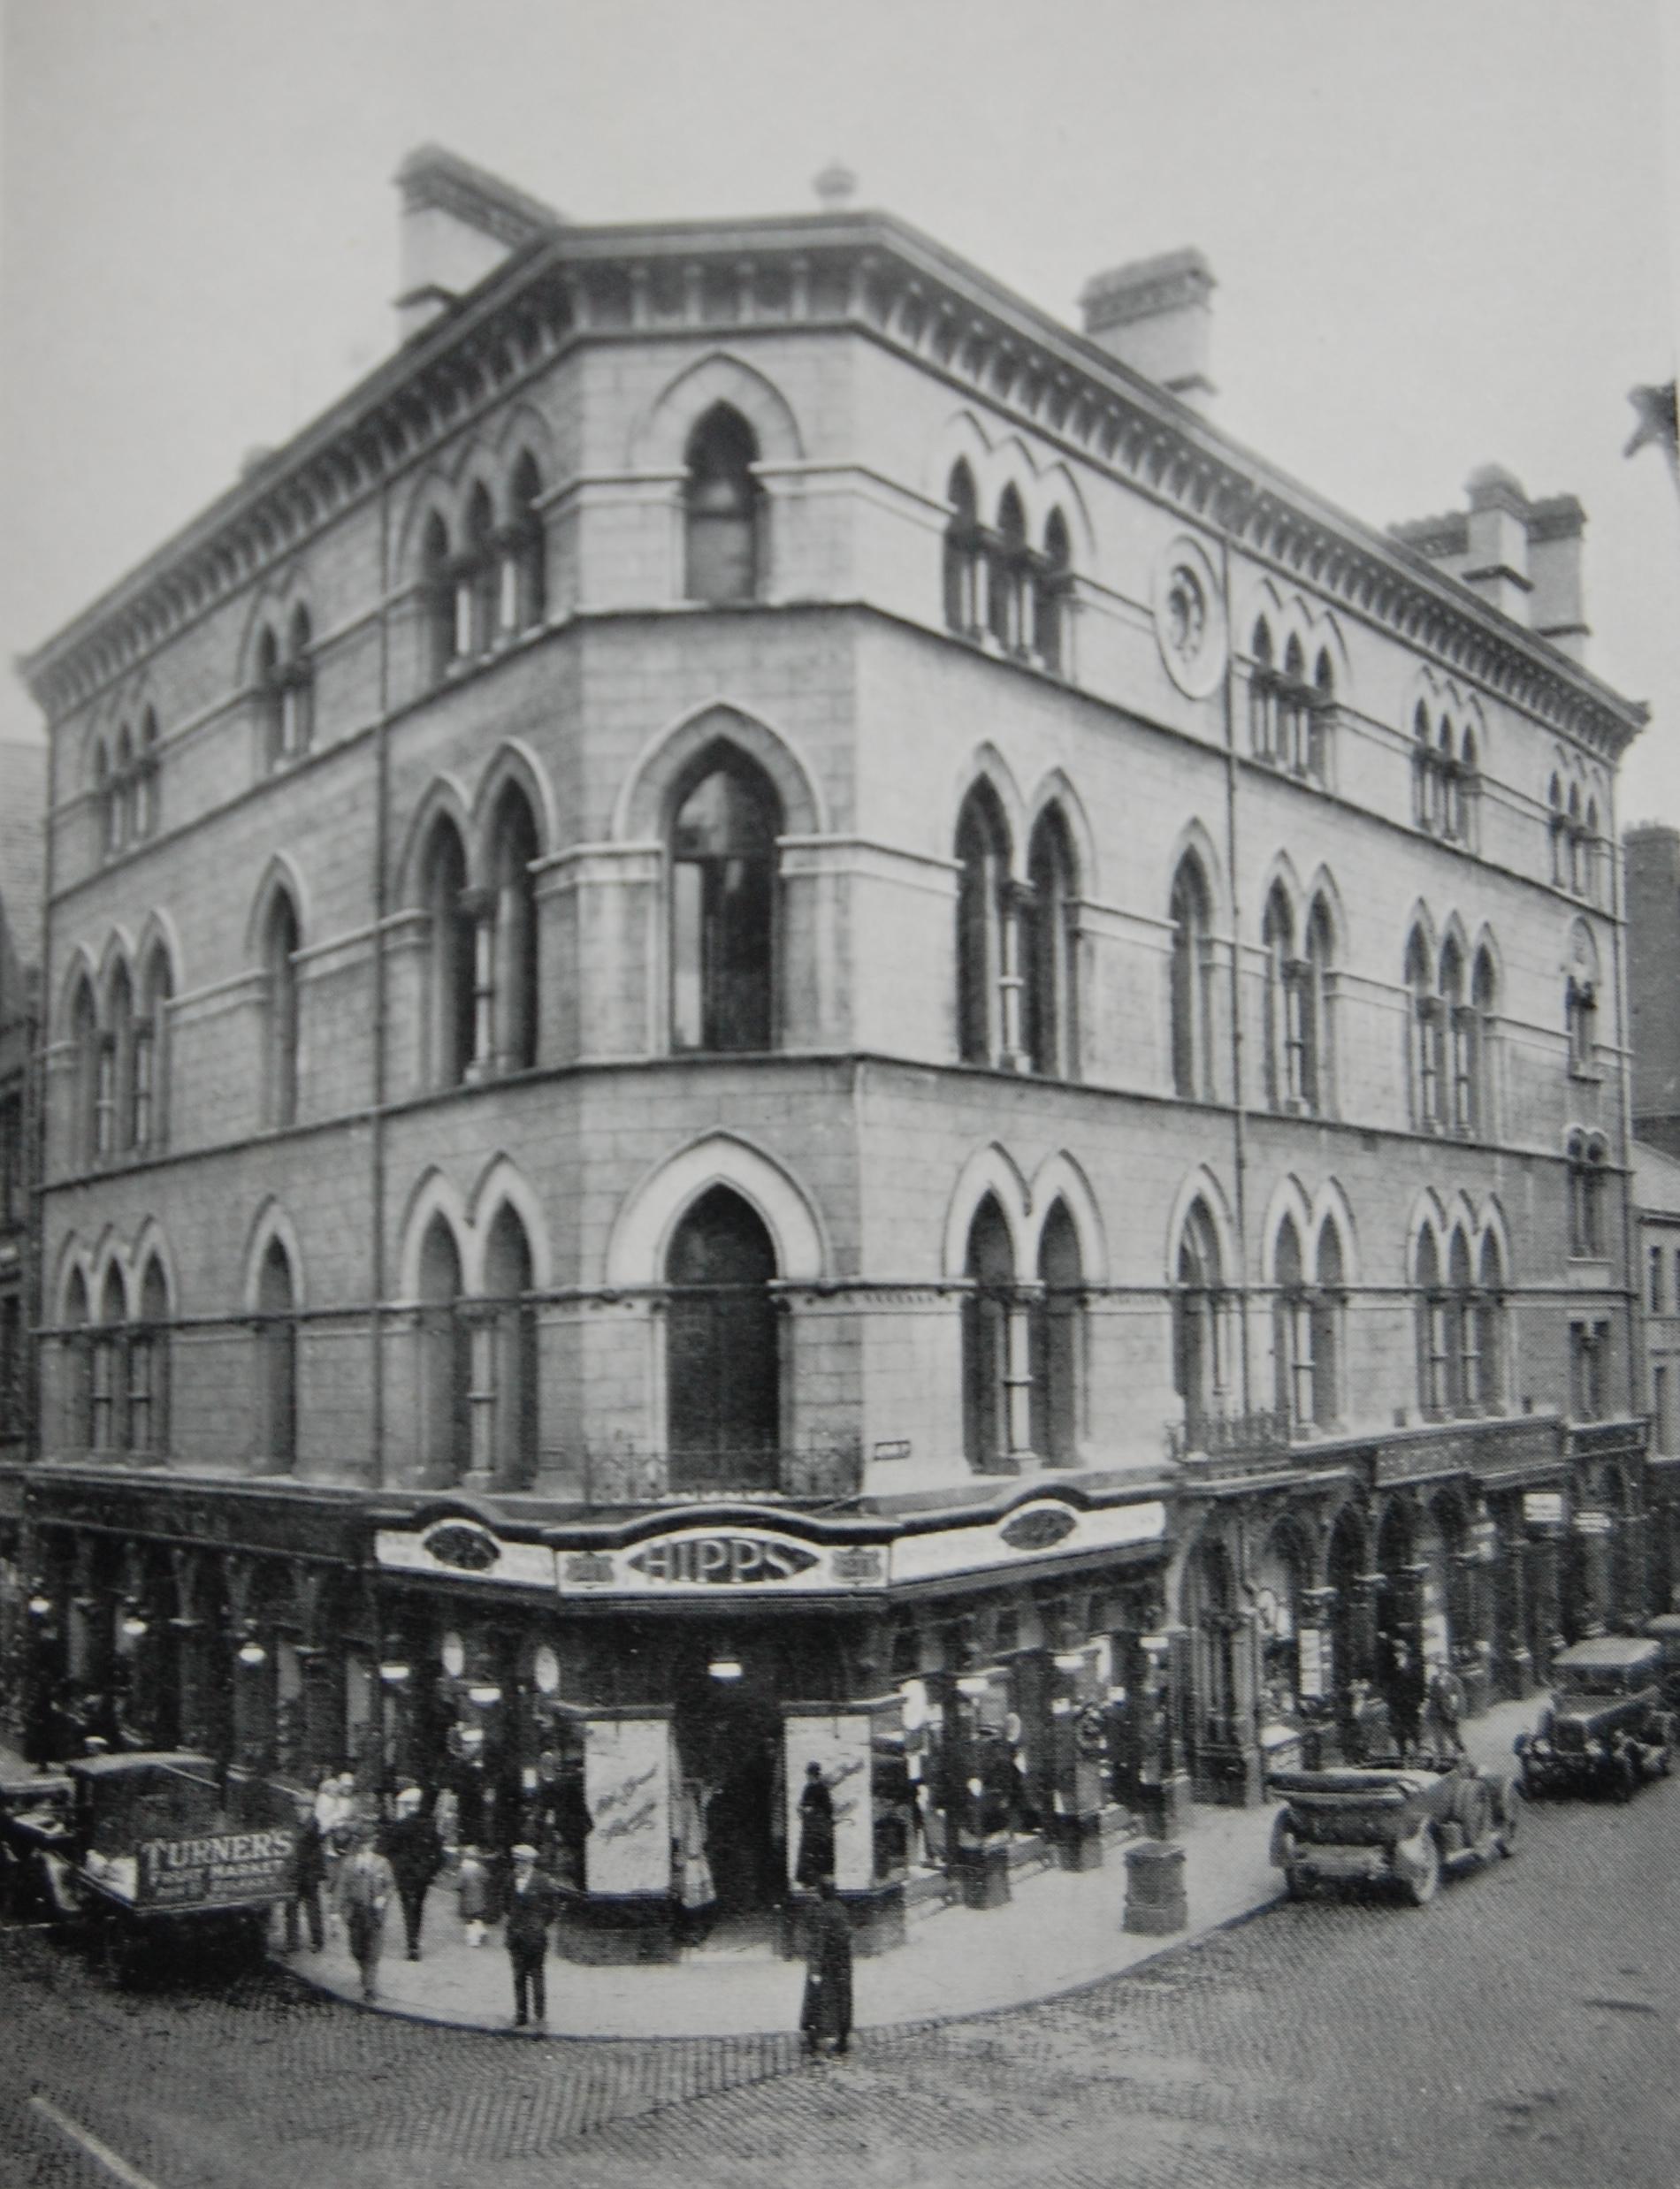 Freemasons' Hall, Arthur Square - circa 1925